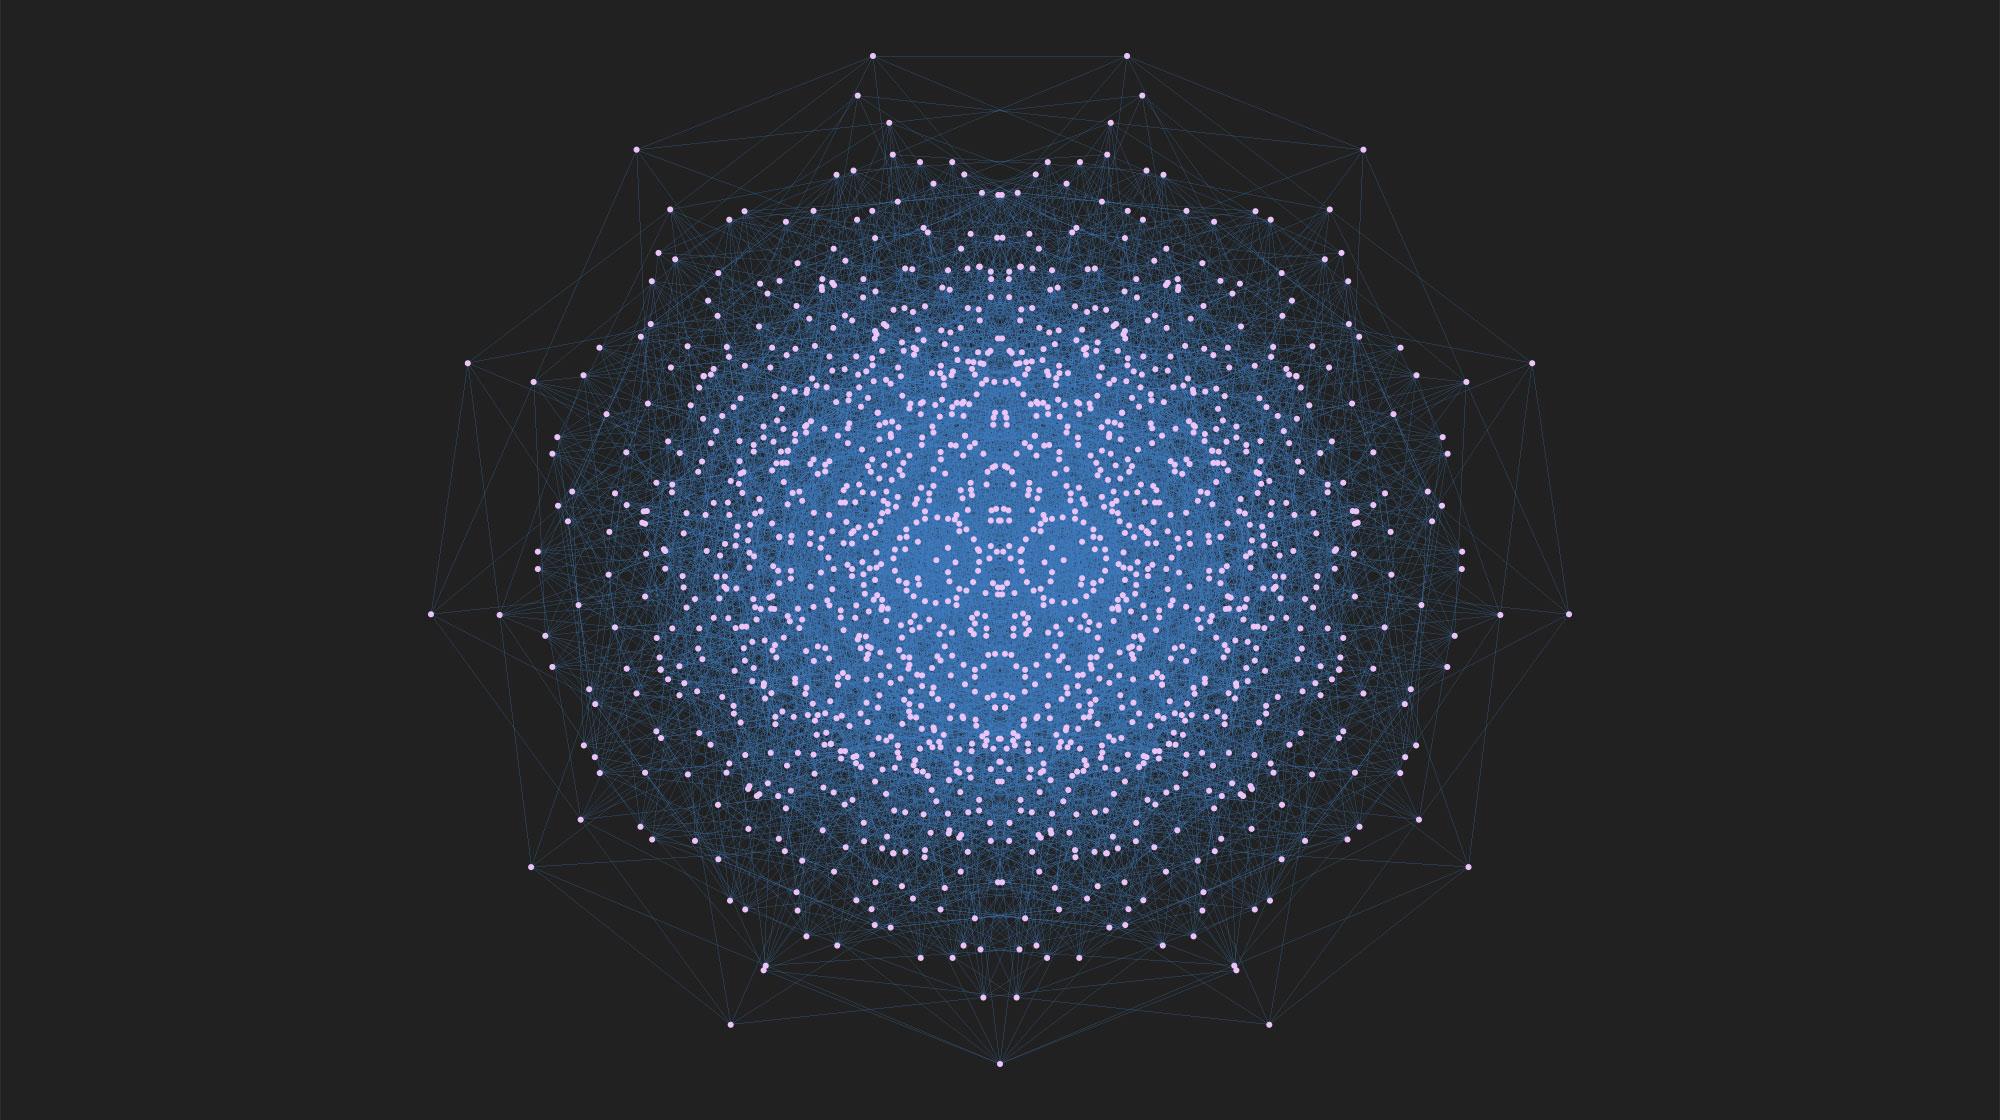 ChromaticColoring_1581vGraph_DeGrey_2K.jpg